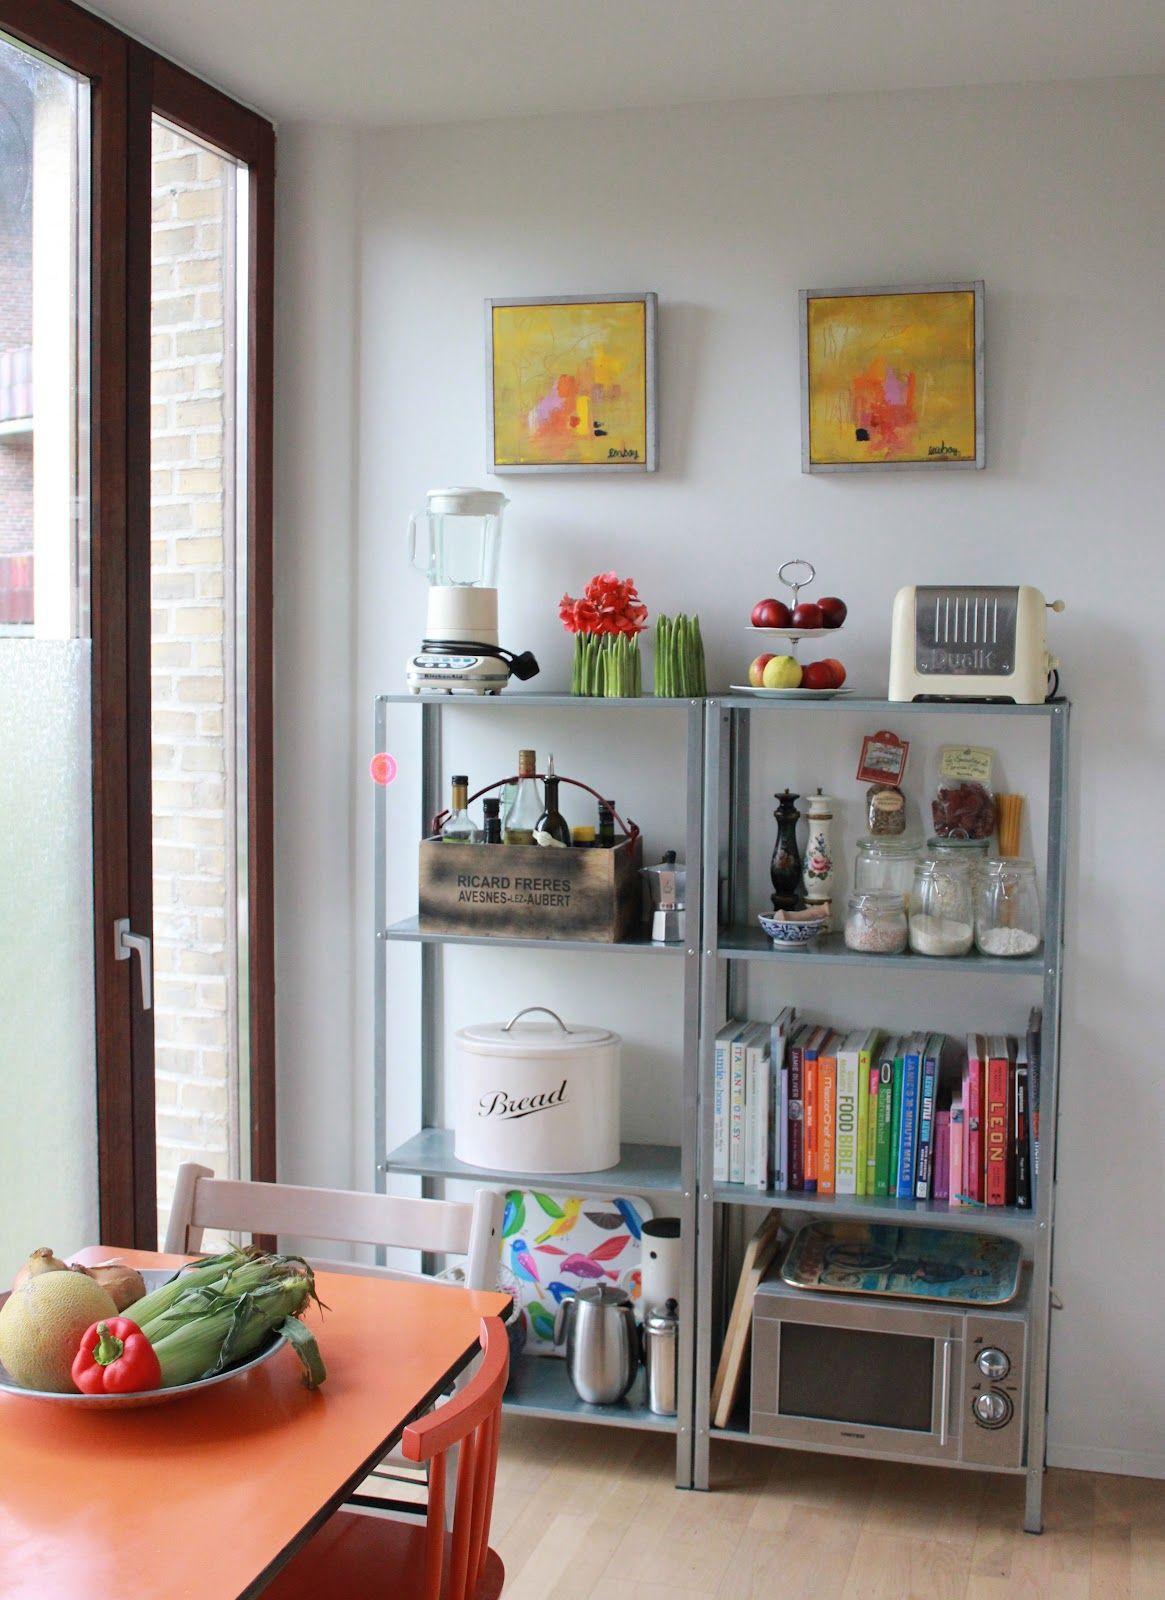 Ikea hyllis for corner by wall kitchen pinterest for Decoracion cocinas ikea